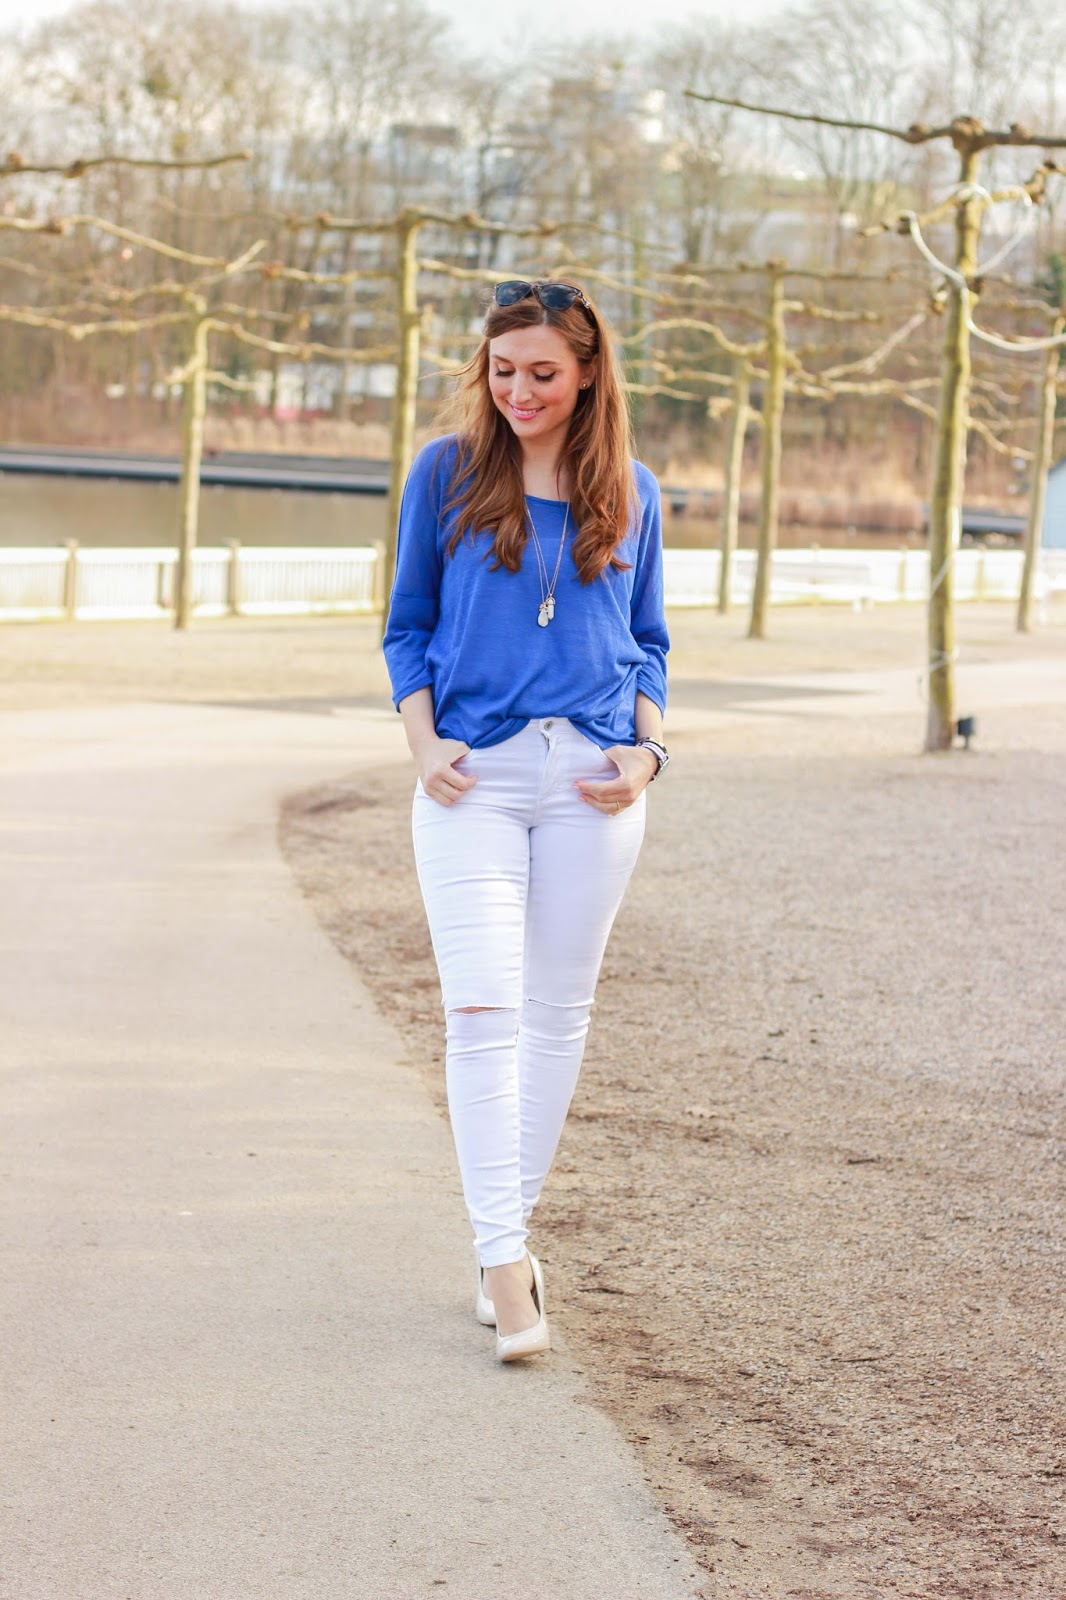 Frankfurt - Fashionblogger aus Frankfurt - Frankfurt Blogger - German Fashionblogger - Fashionblog - Weiße Hose - Weiße Jeans - Streetstyleinspiration  - Bad Nauheim